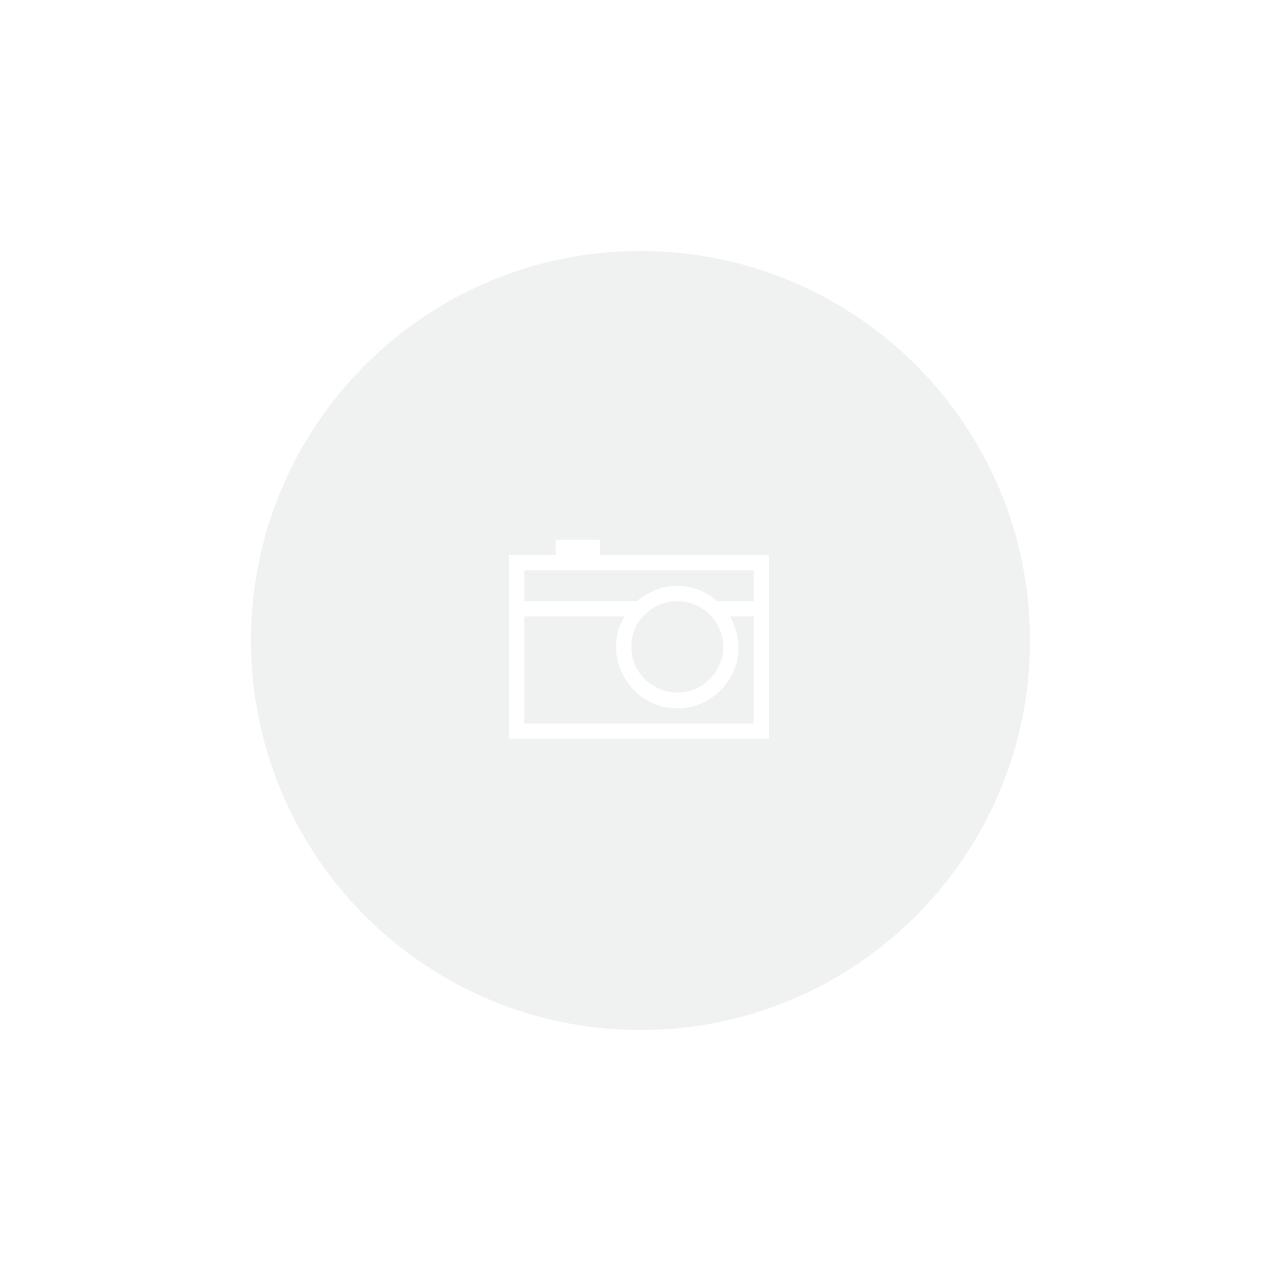 MANOPLA SHIMANO PRO SILICONE XC 32mm X 130mm